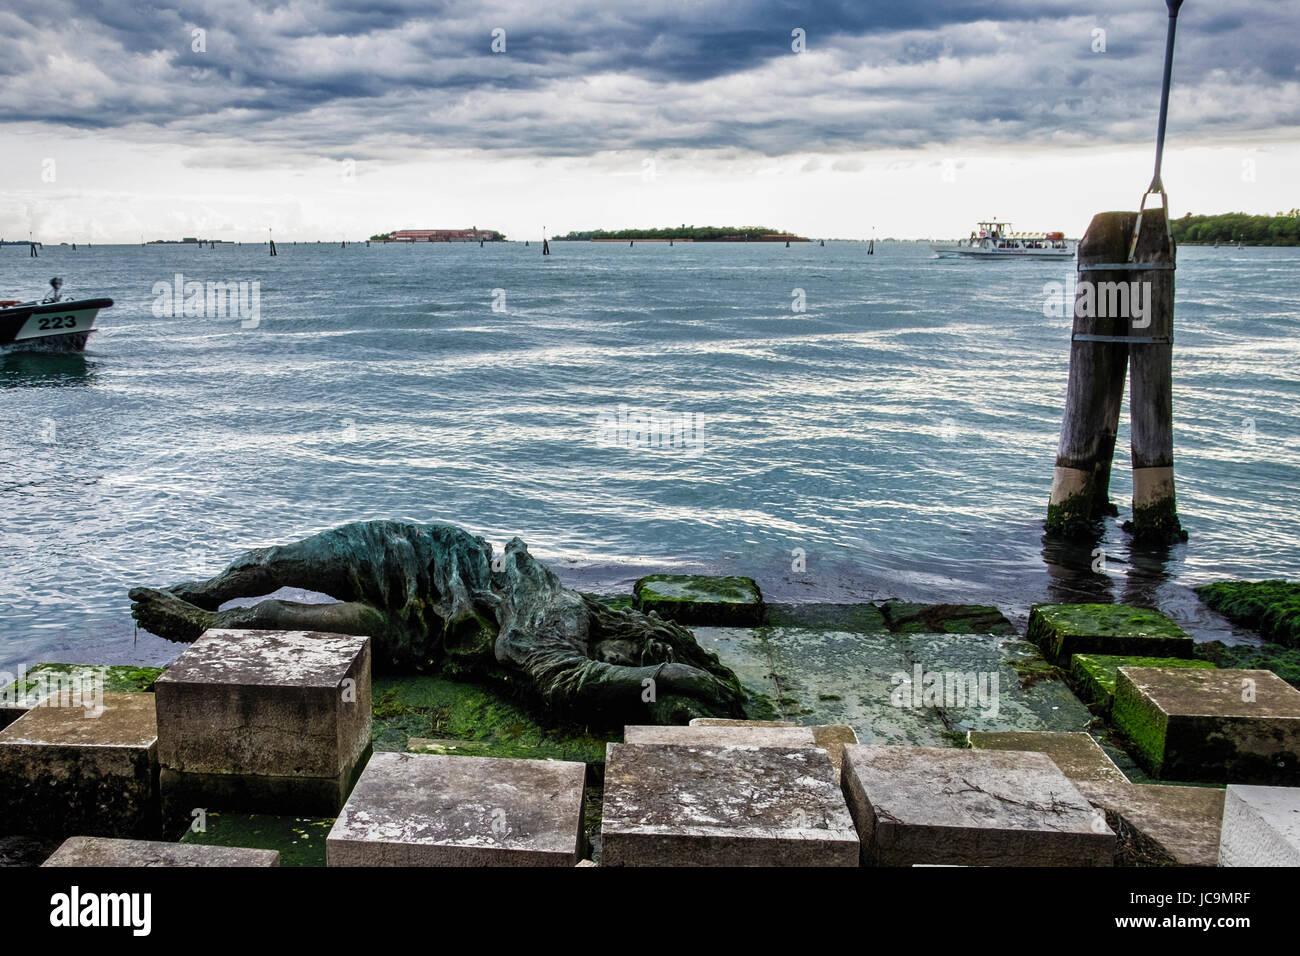 Italy Venice.War memorial,Venezia alla partigiana. Water side Bronze sculpture commemorates the women of the Italian - Stock Image